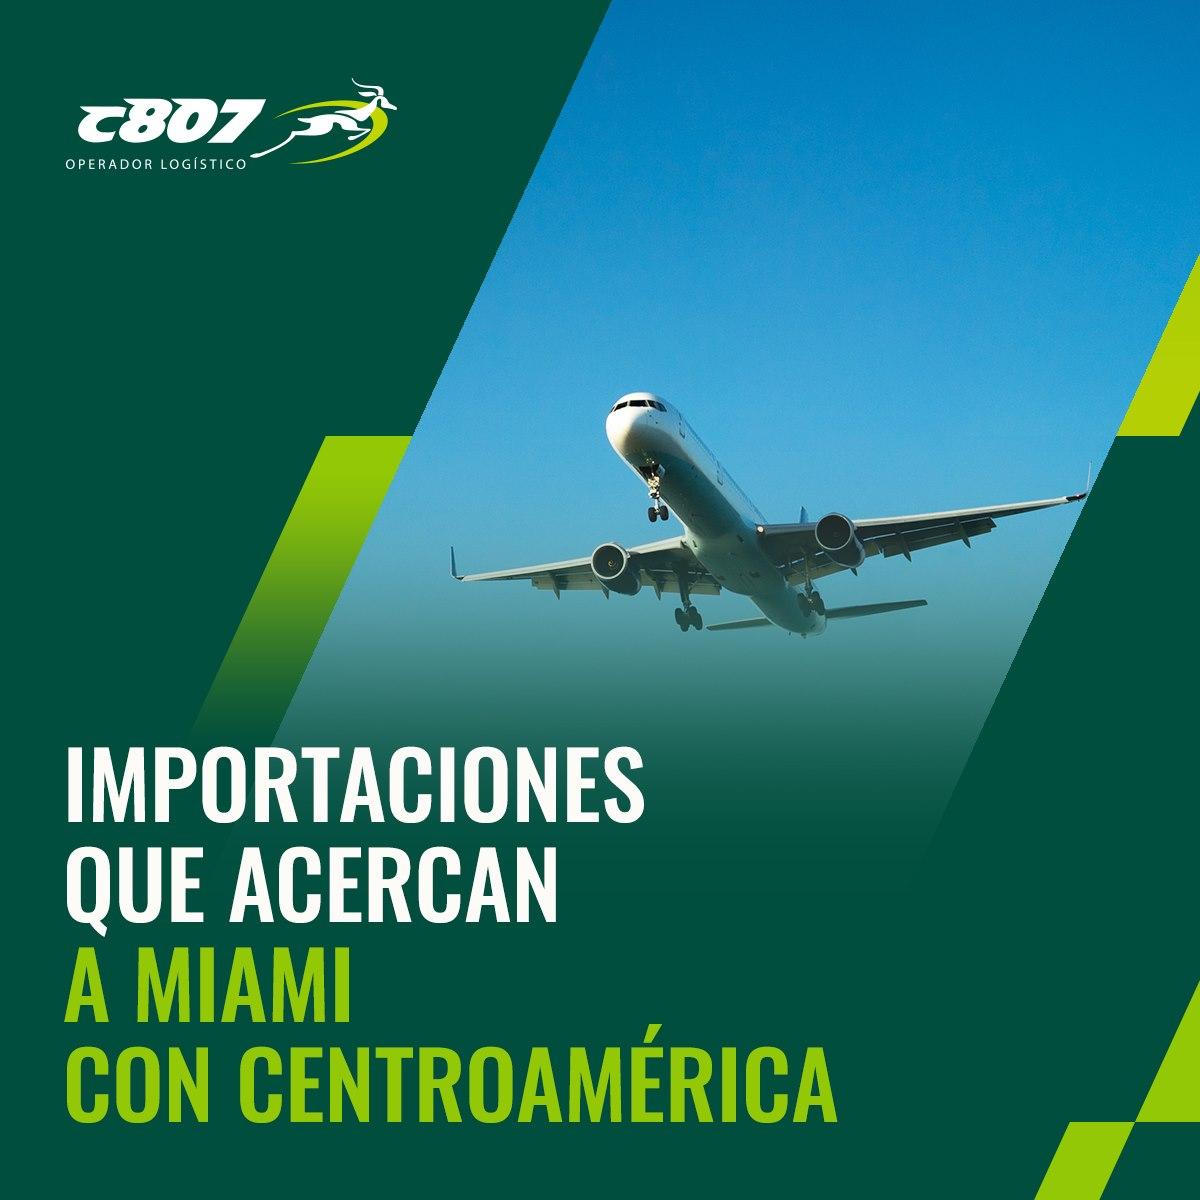 C807 Panama, S.A.